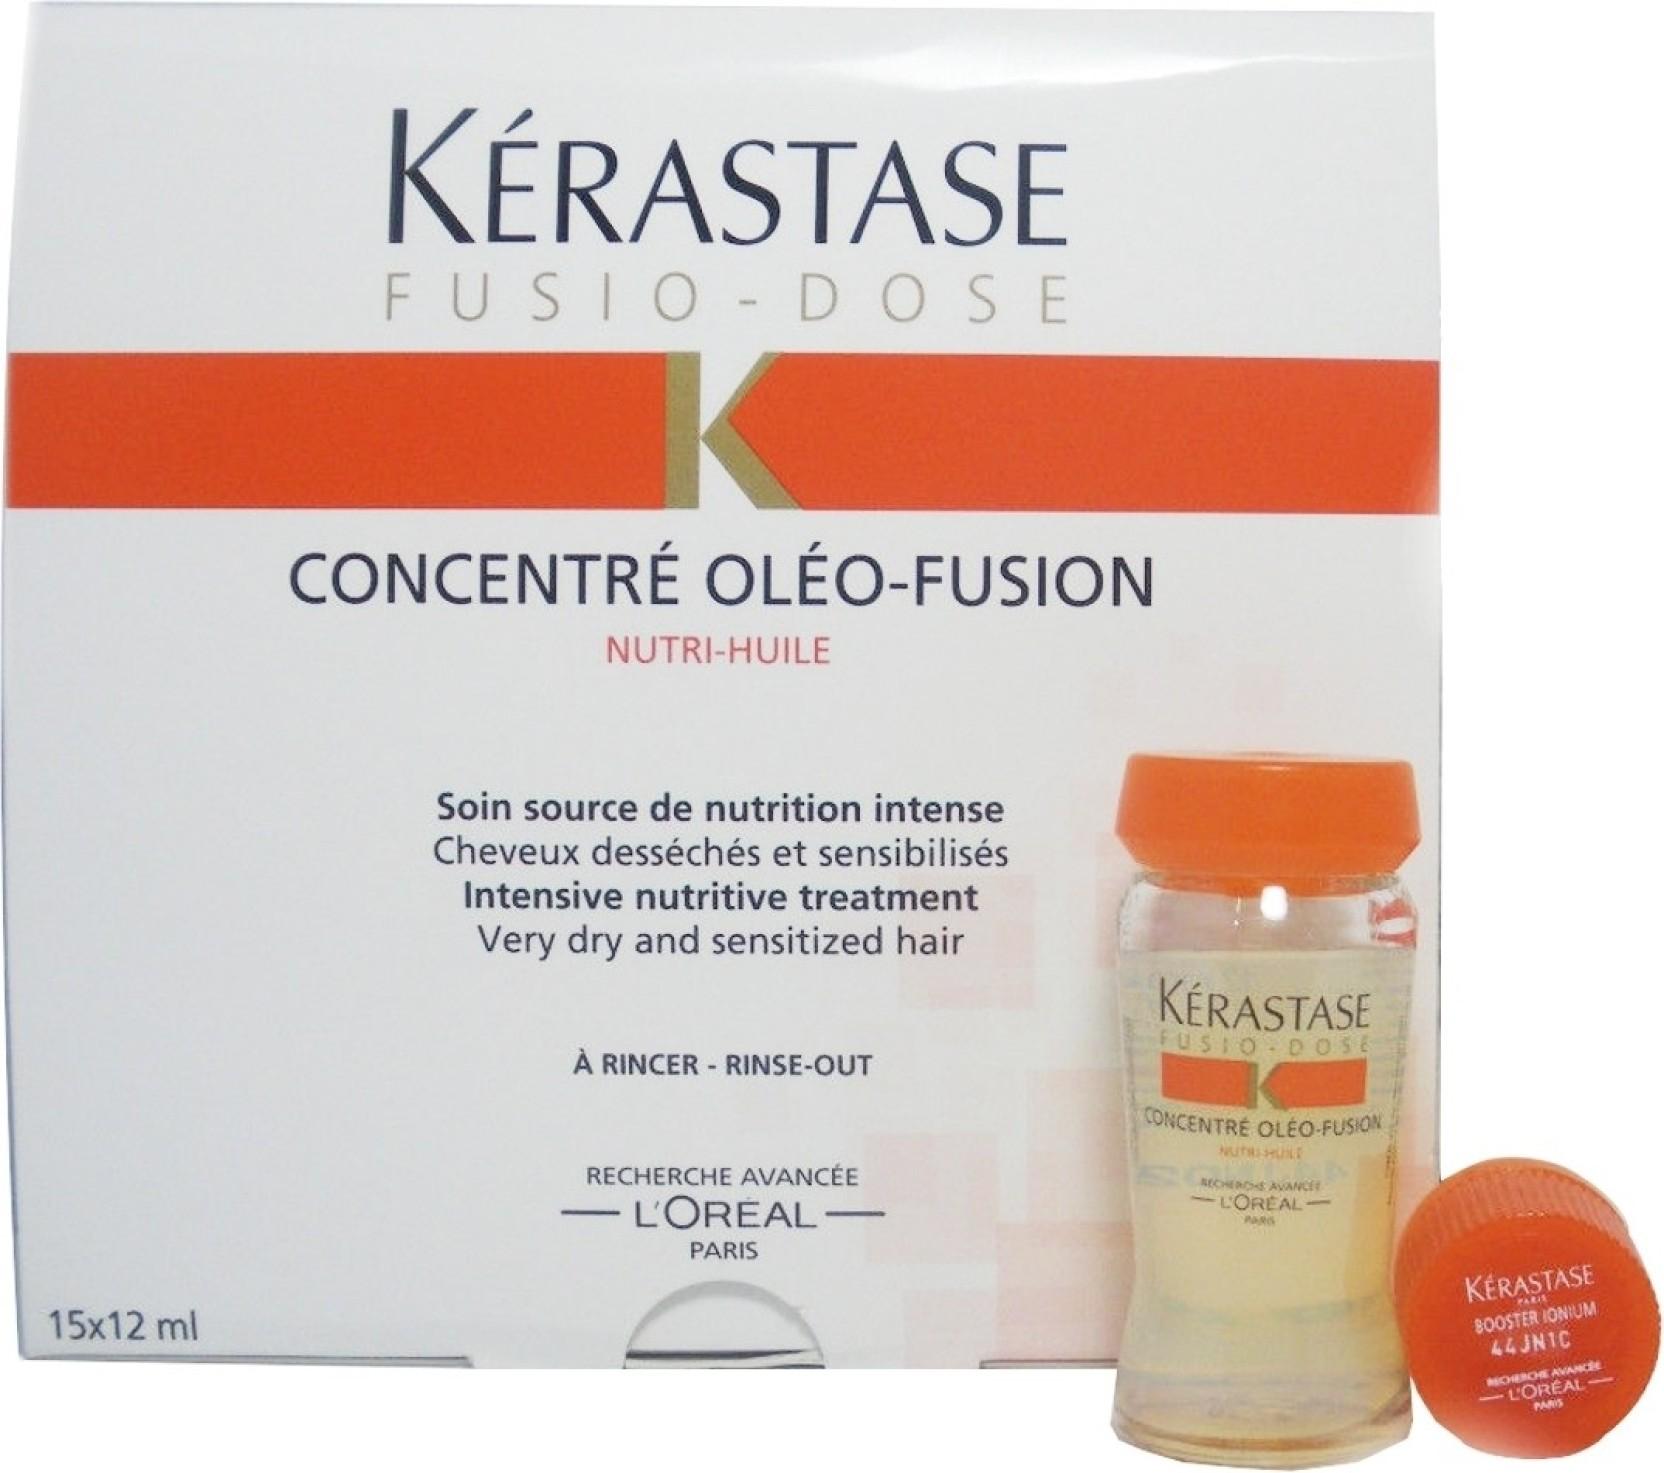 Kerastase fusio dose concentre oleo fusion intensive nutritive treatment price in india buy - Kerastase salon treatment ...